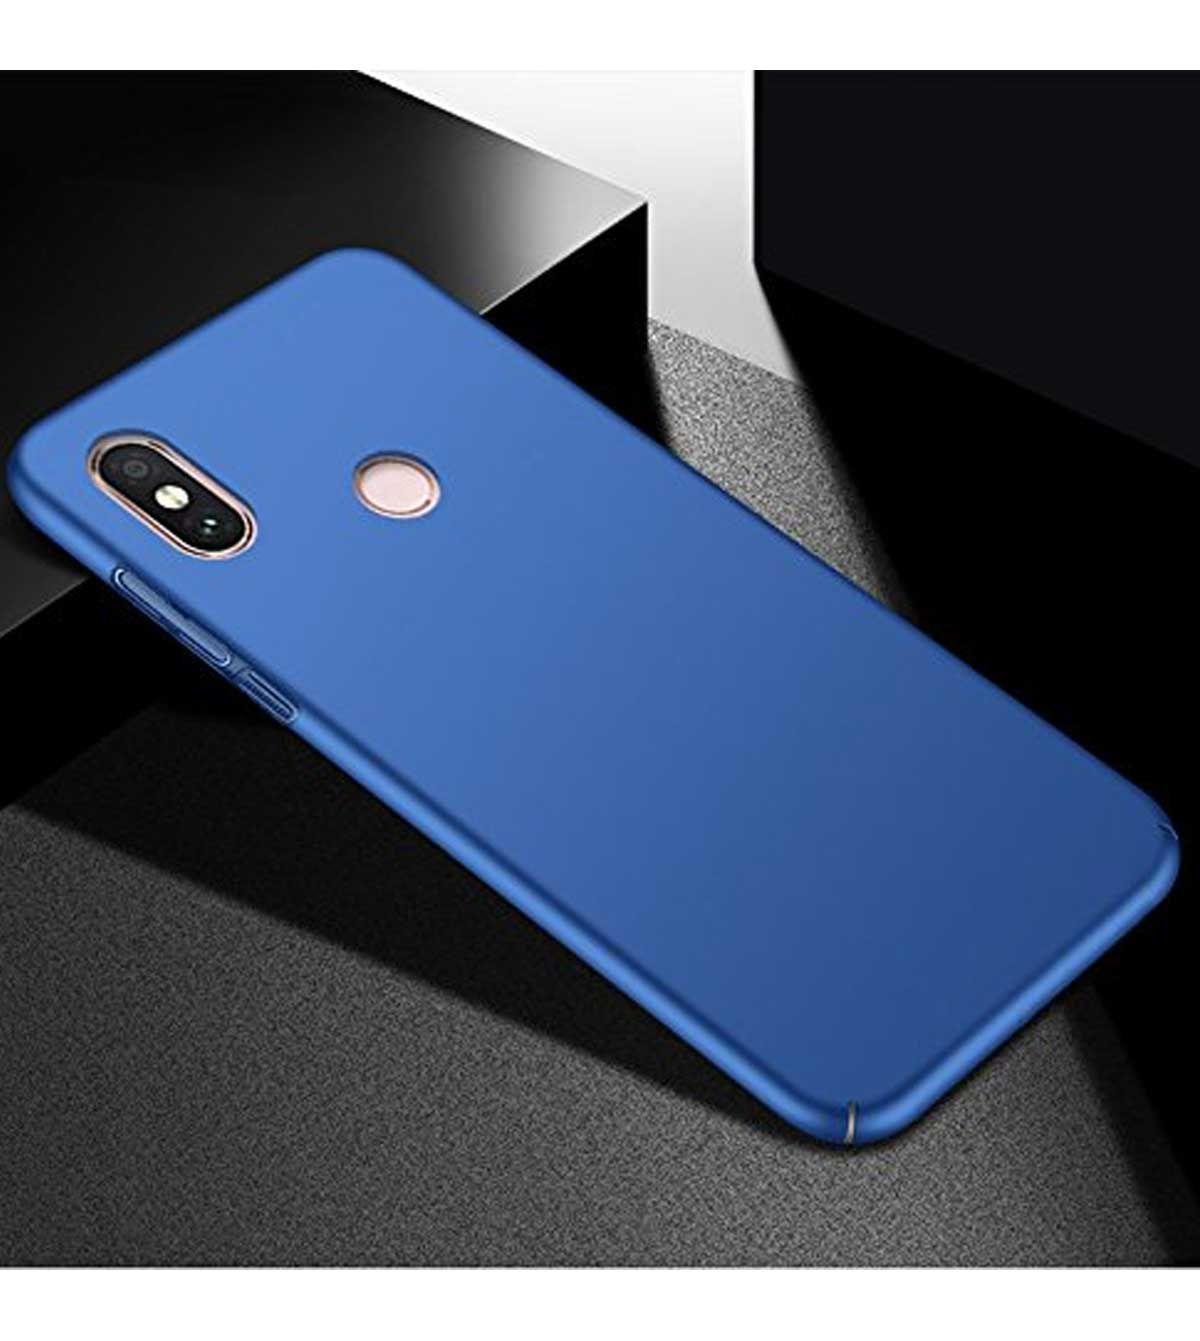 4e1bfce0c Xiaomi Redmi Note 5 Pro Plain Cases TBZ - Blue - Plain Back Covers ...